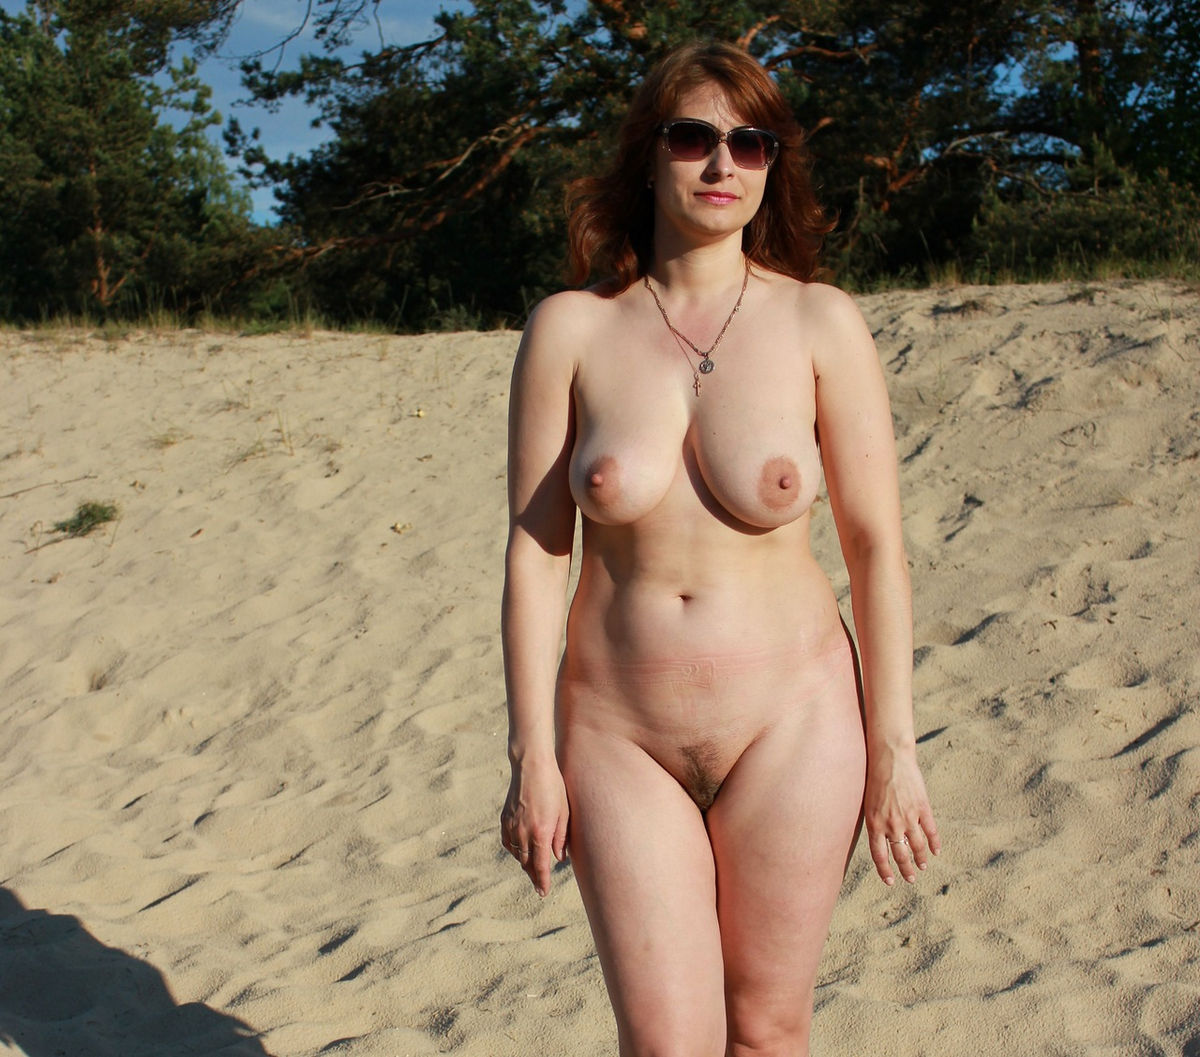 Apologise, Big amateur wife posing nude